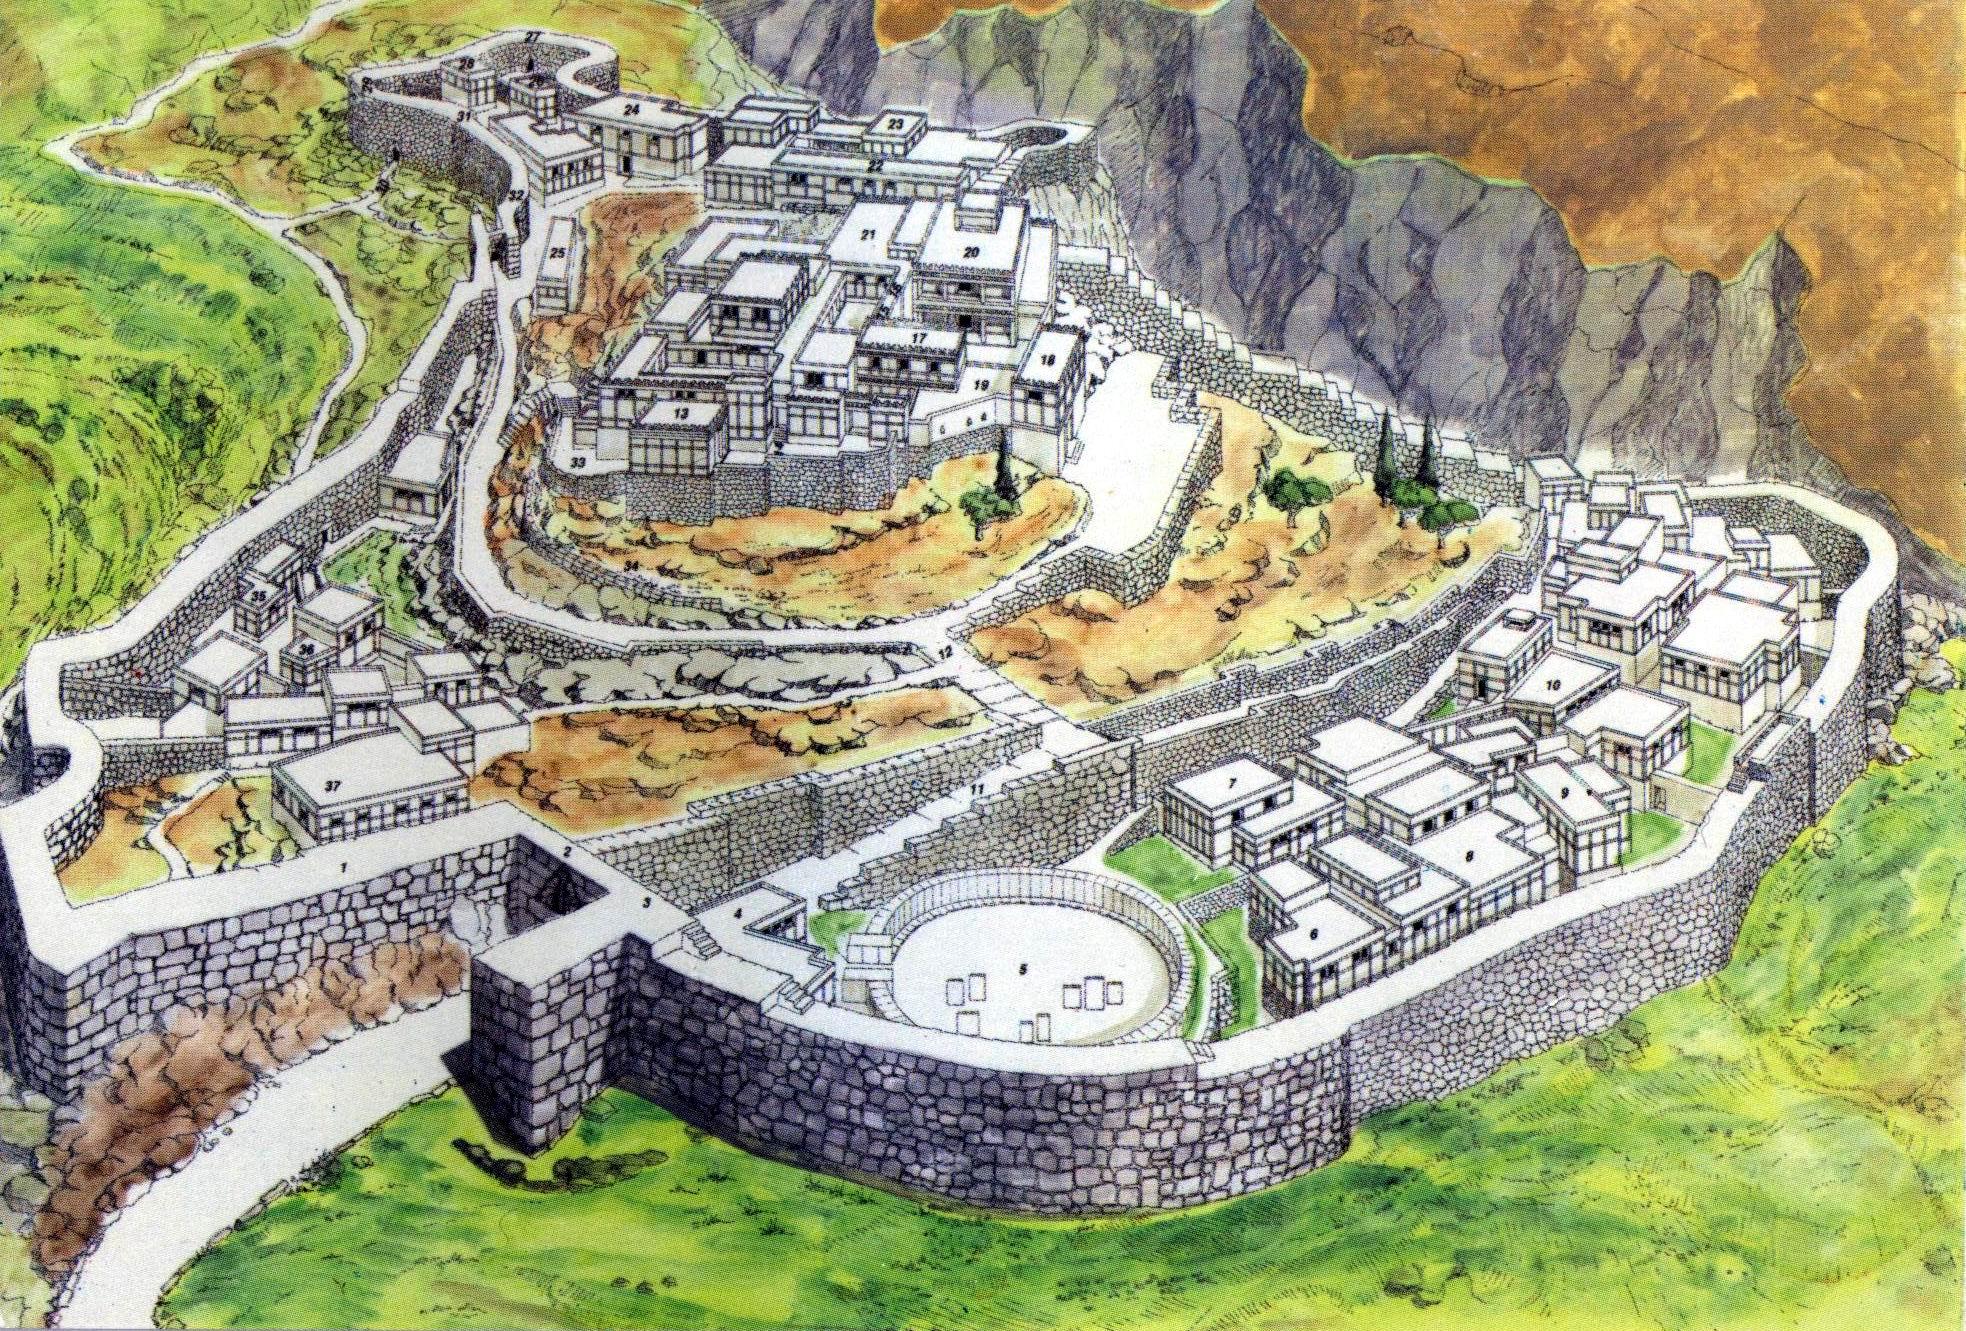 The Mycenae Citadel